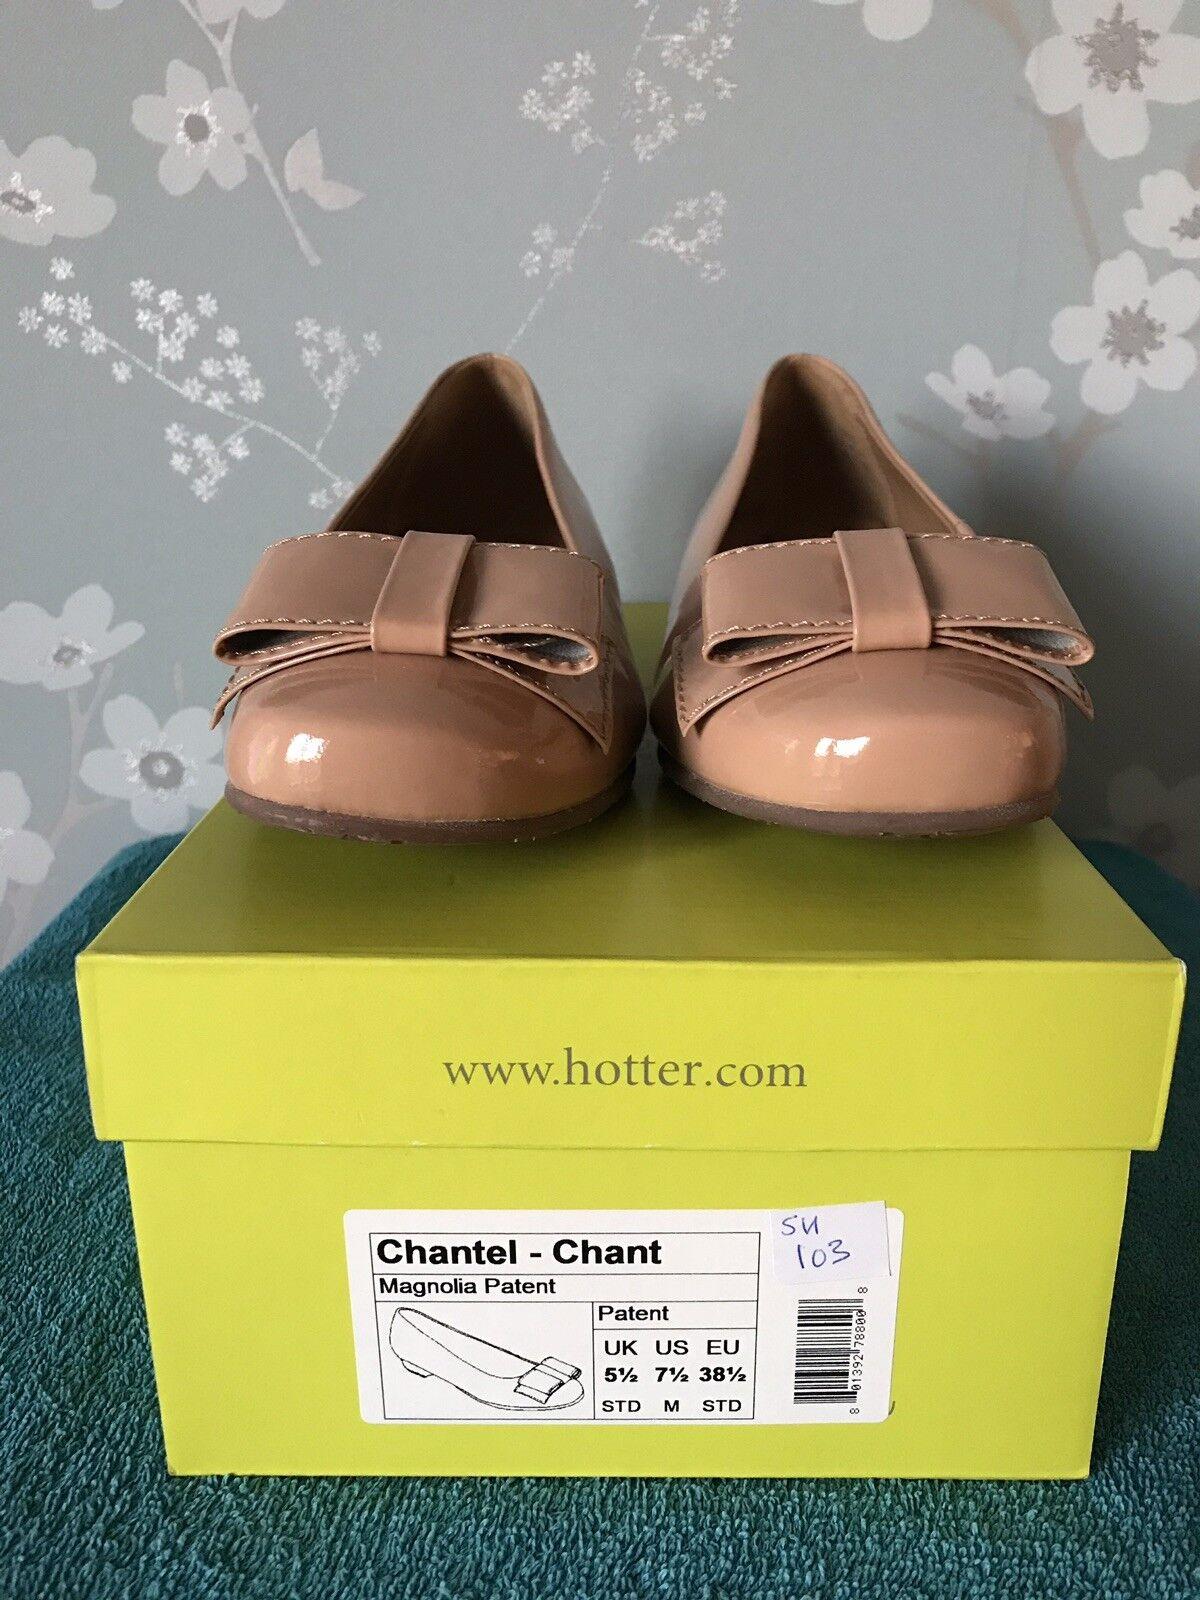 Ladies Hotter Heeled Chantel shoes Uk 5.5 Patent Leather Magnolia BNWB